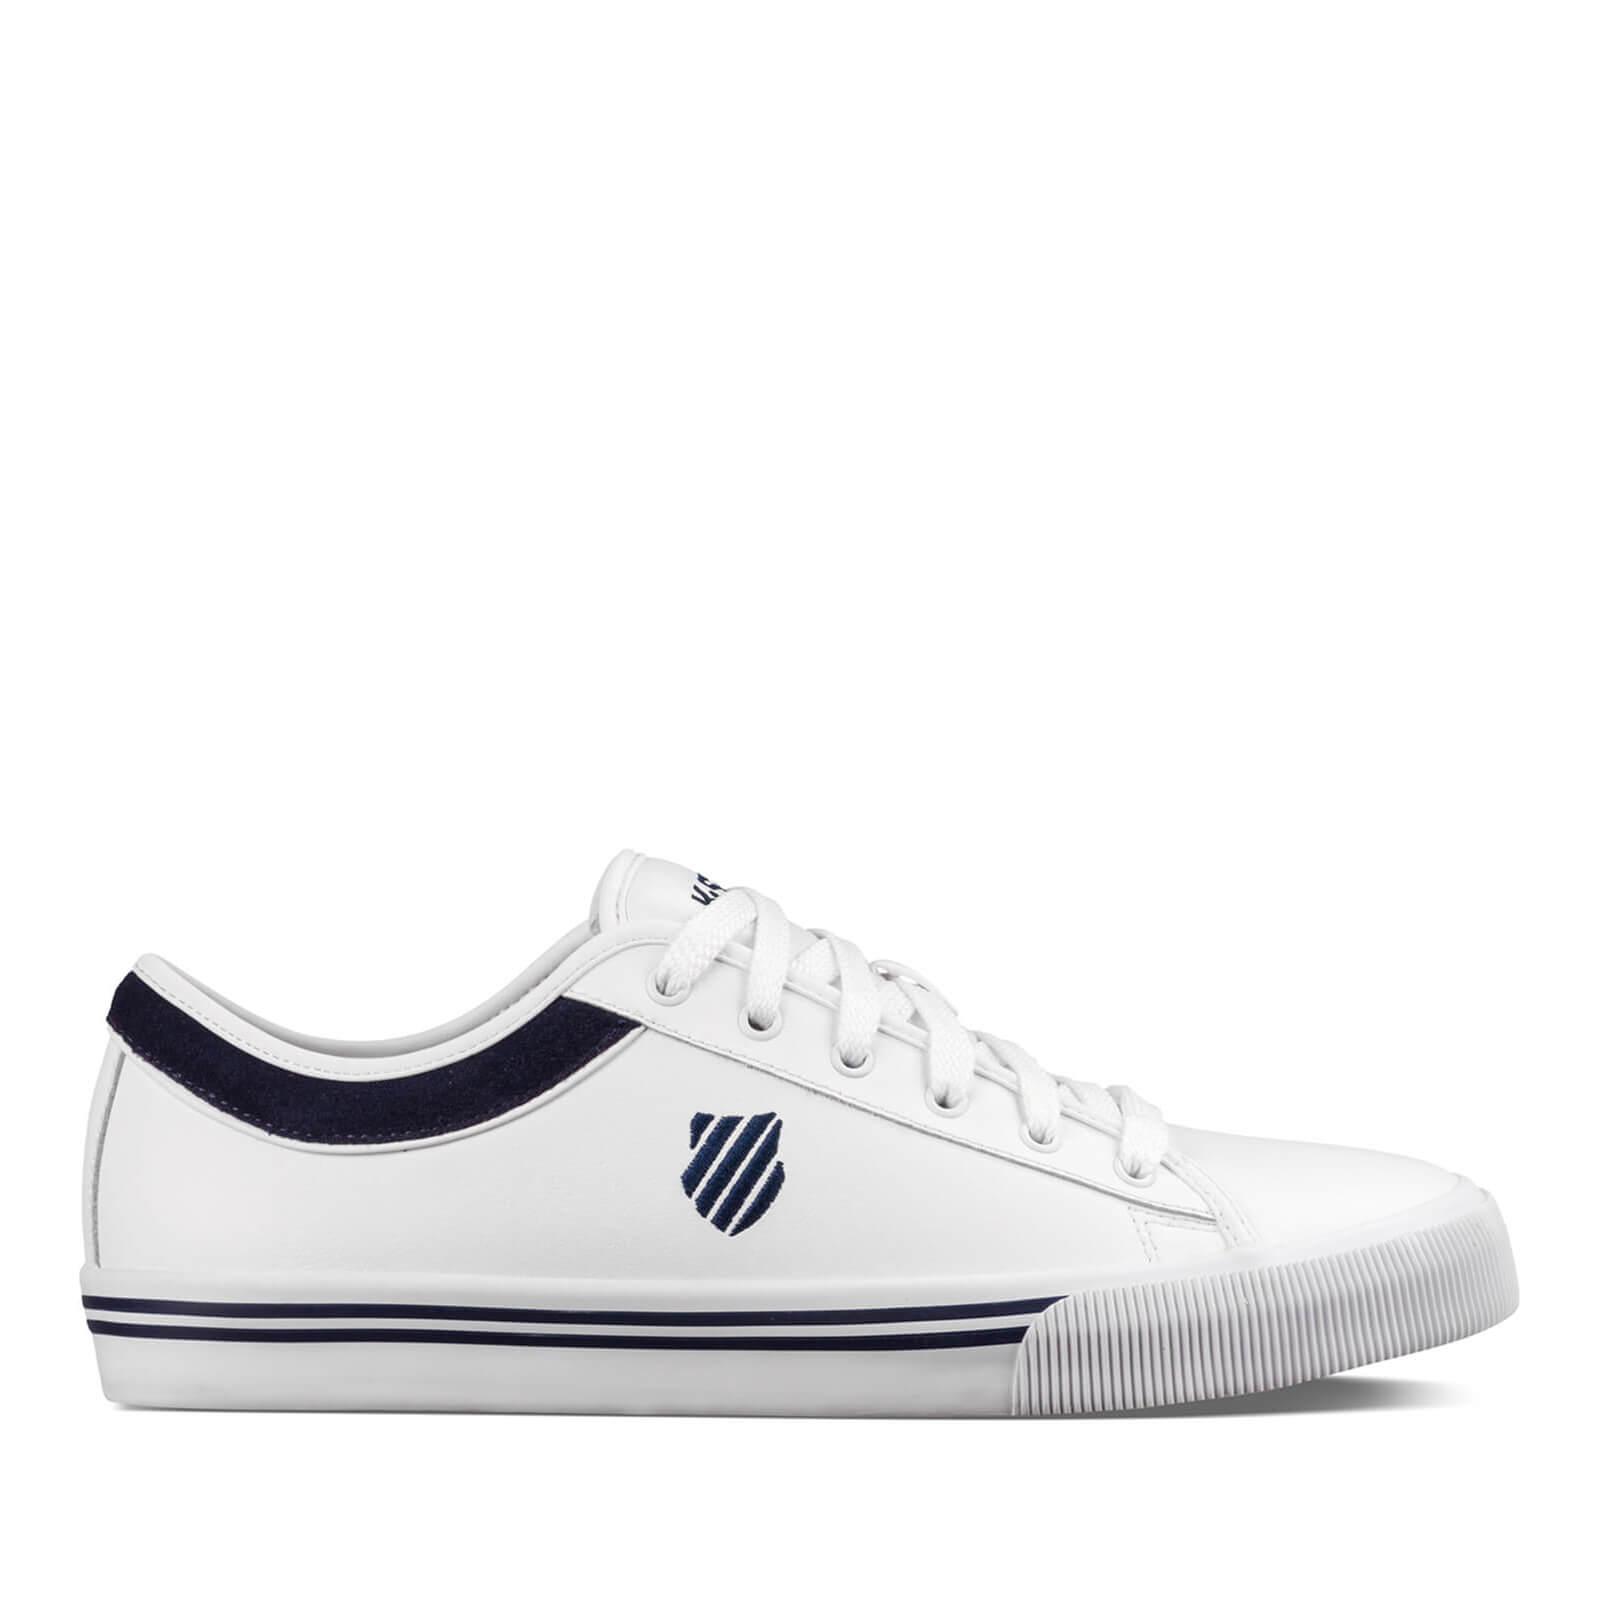 6bc963fe53f04d K-Swiss Men s Bridgeport II Trainers - White Navy Mens Footwear